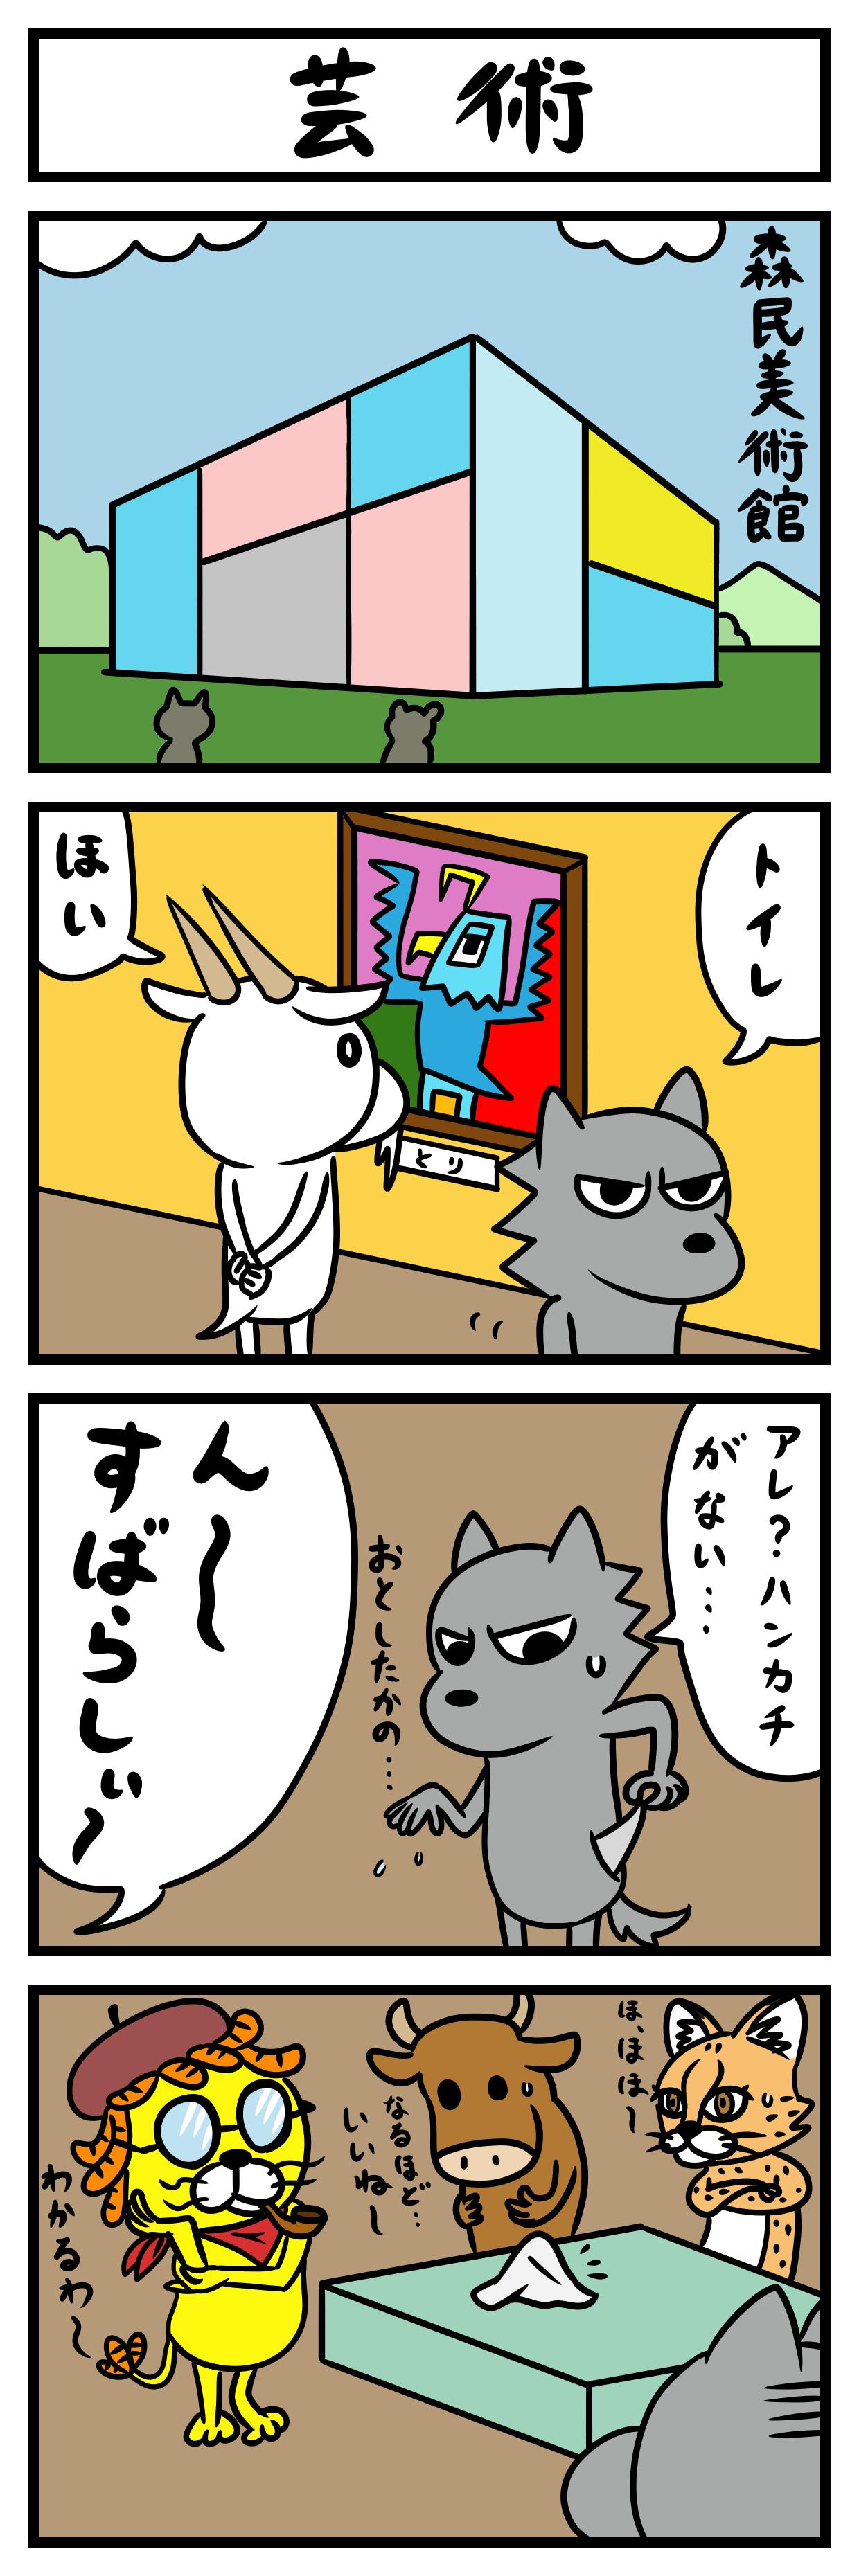 4koma101芸術